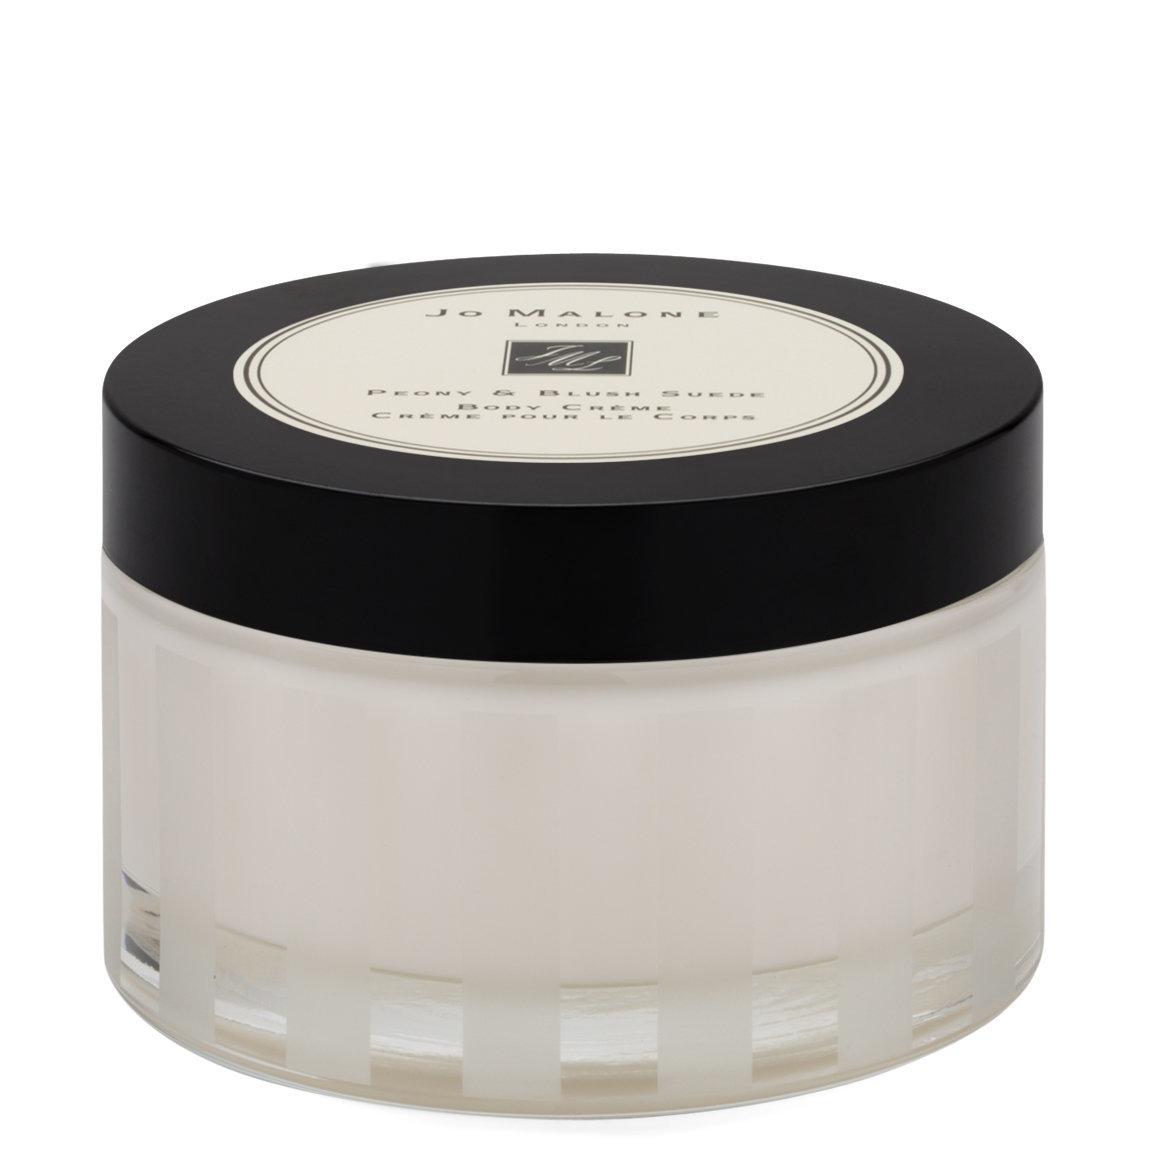 Jo Malone London Peony & Blush Suede Body Crème product swatch.